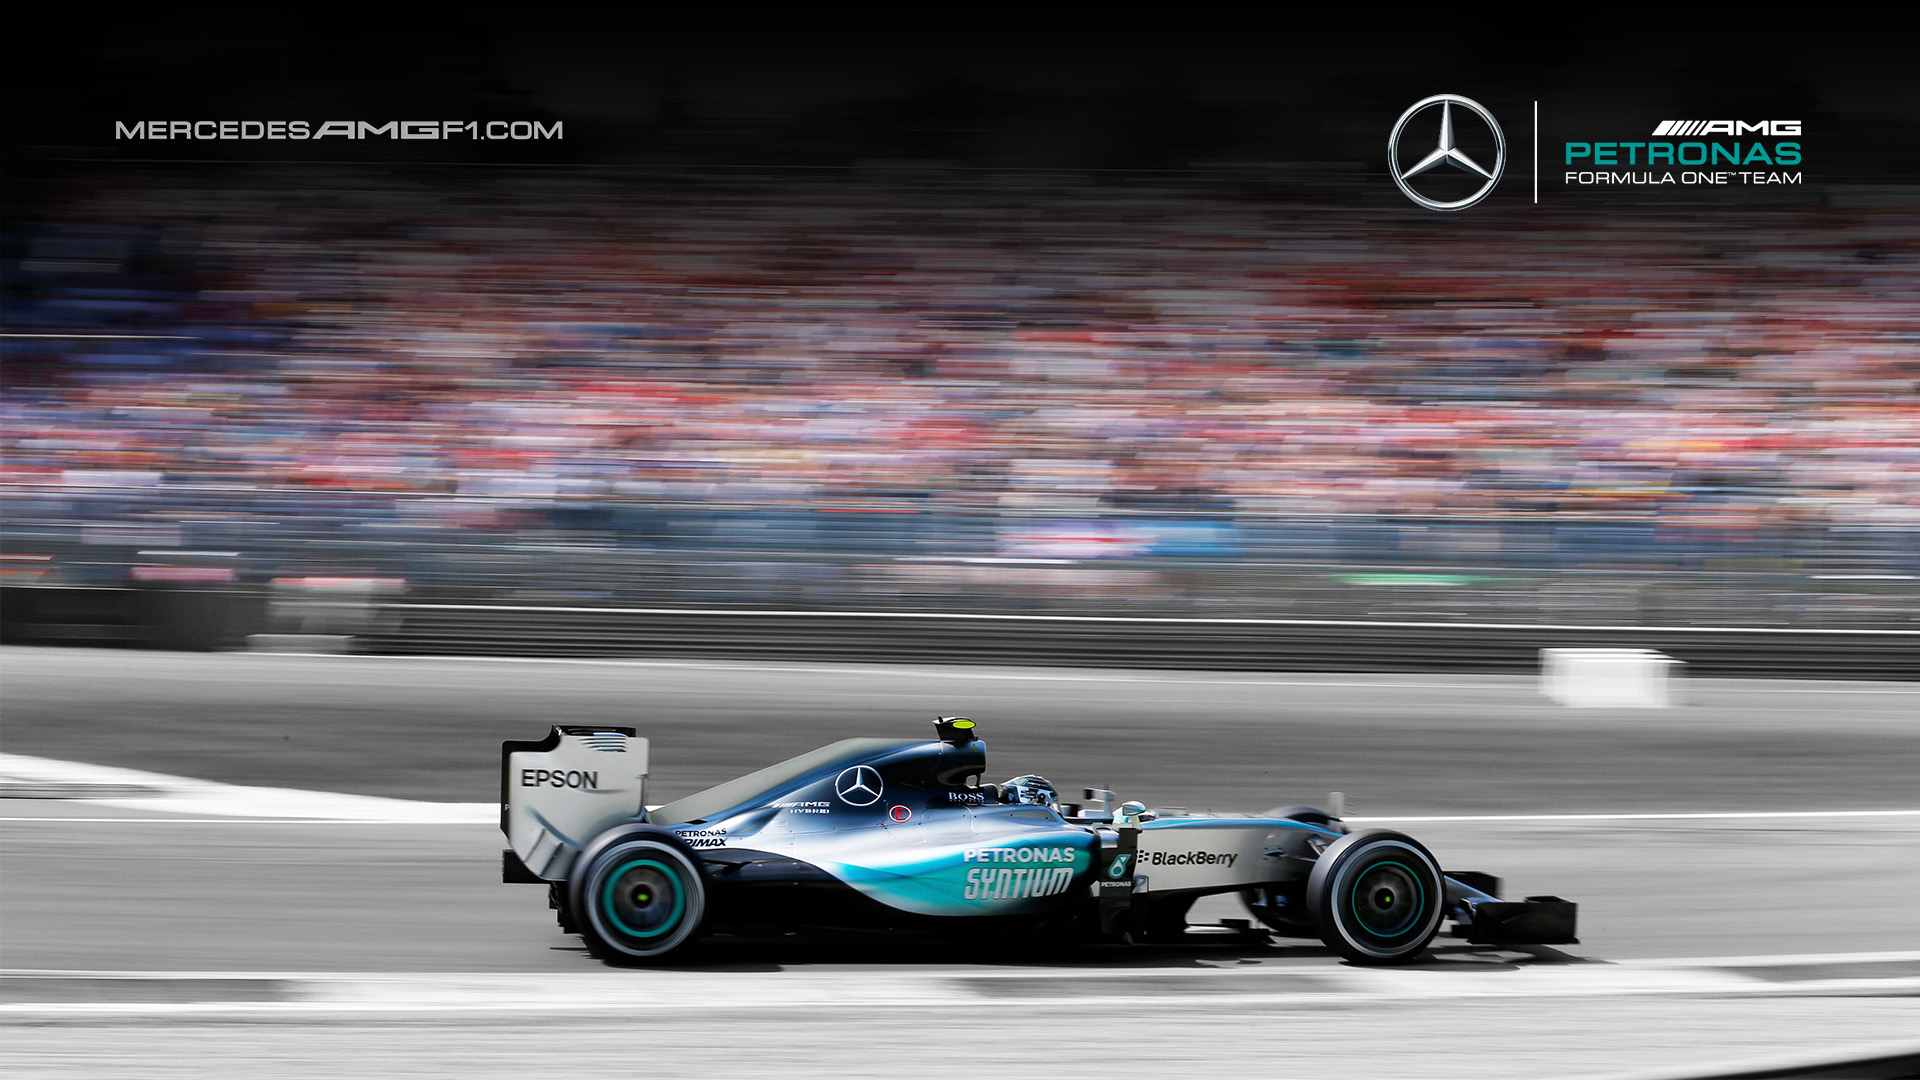 Mercedes amg petronas w08 wallpaper 6